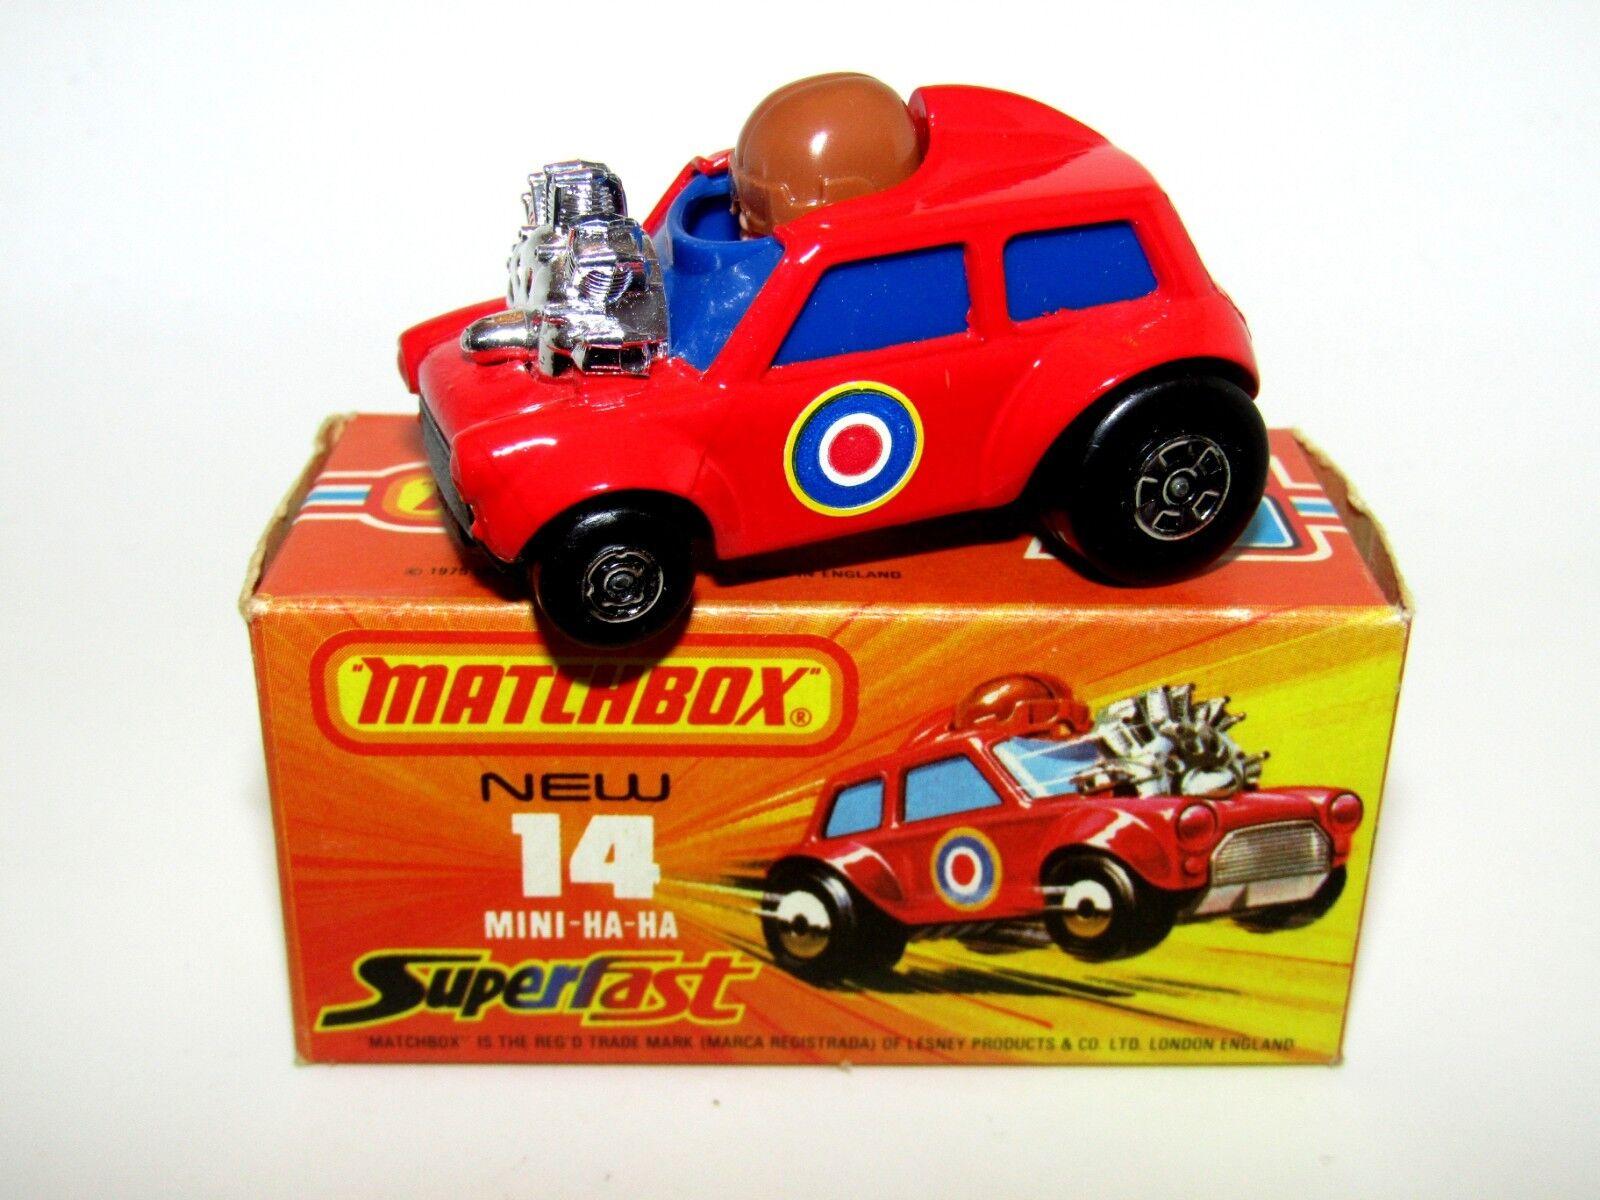 MATCHBOX SUPERFAST nº 14 MINI HA-HA très Bleu Foncé Verre Verre Verre En parfait état, dans sa boîte très rare 14f2aa